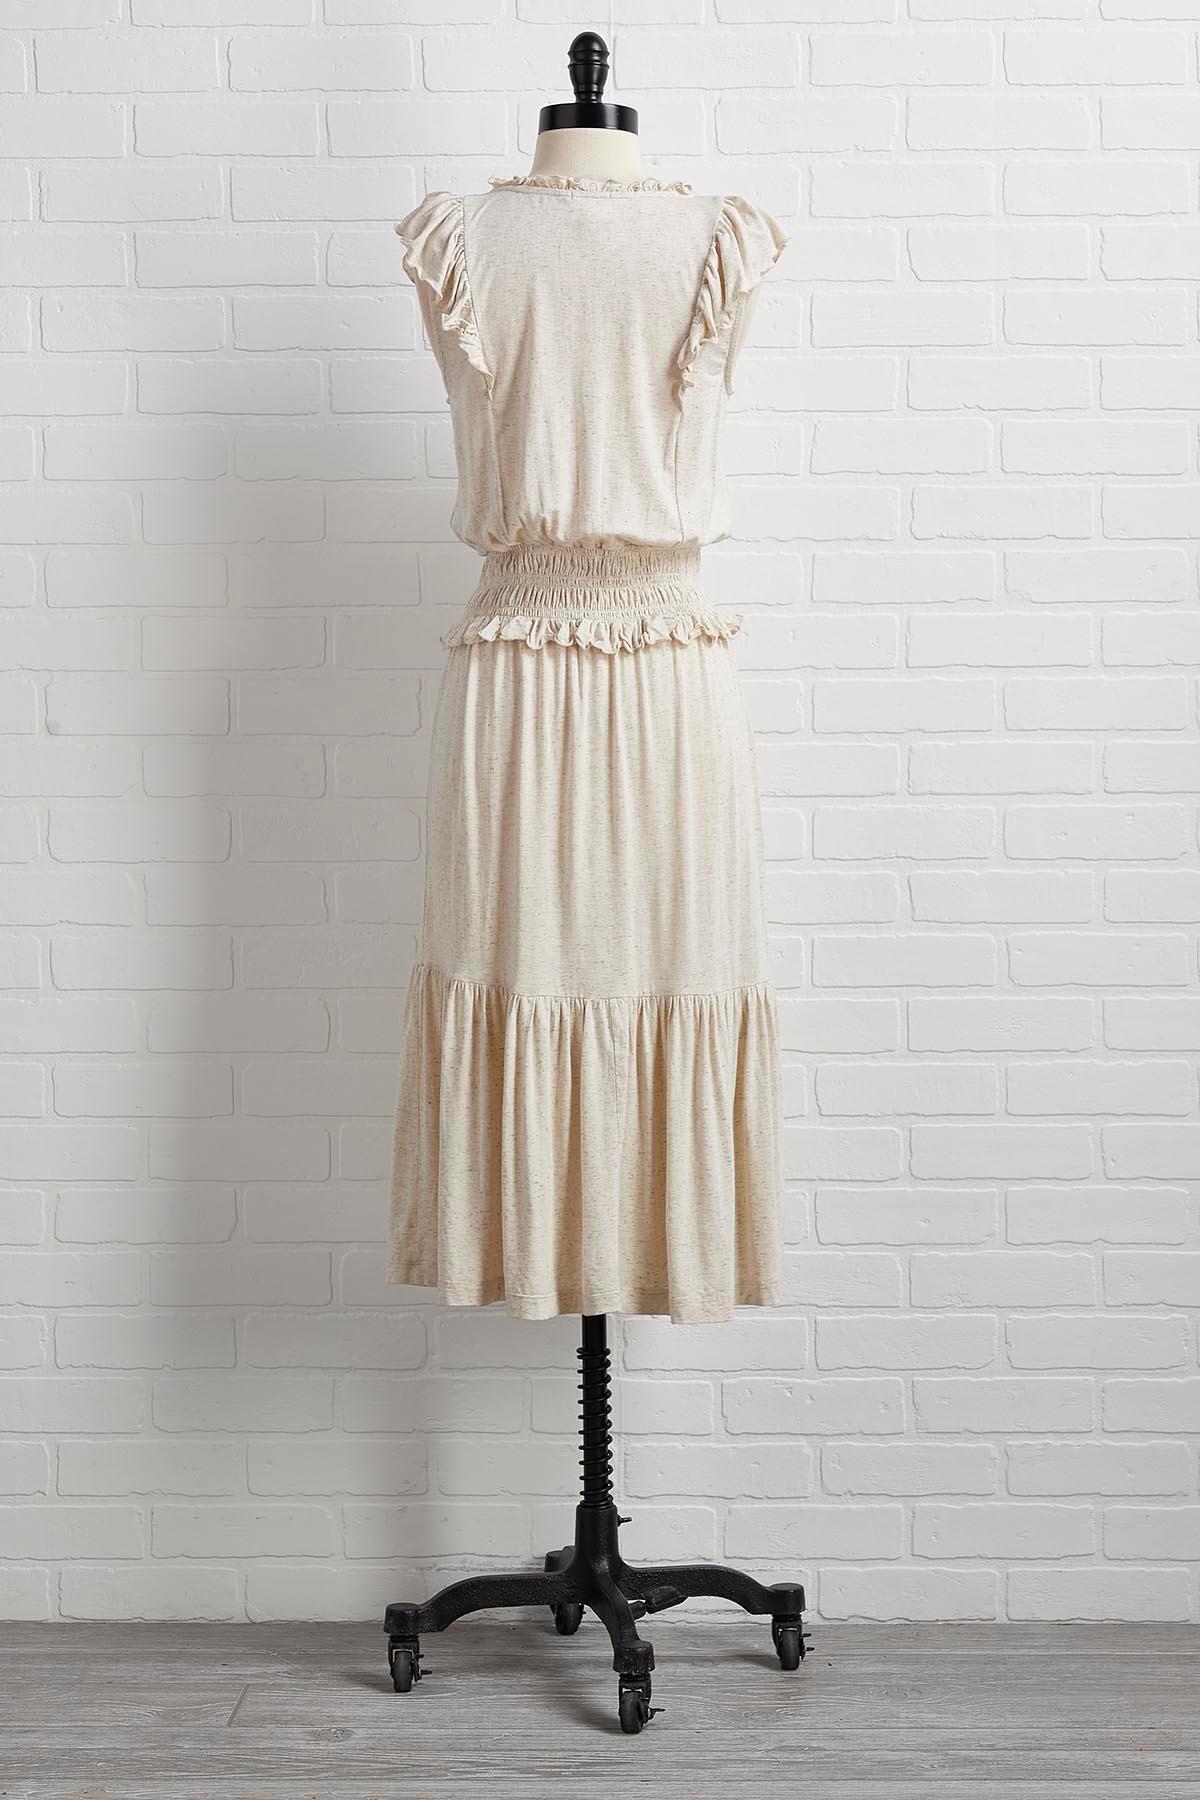 Like A Natural Woman Dress